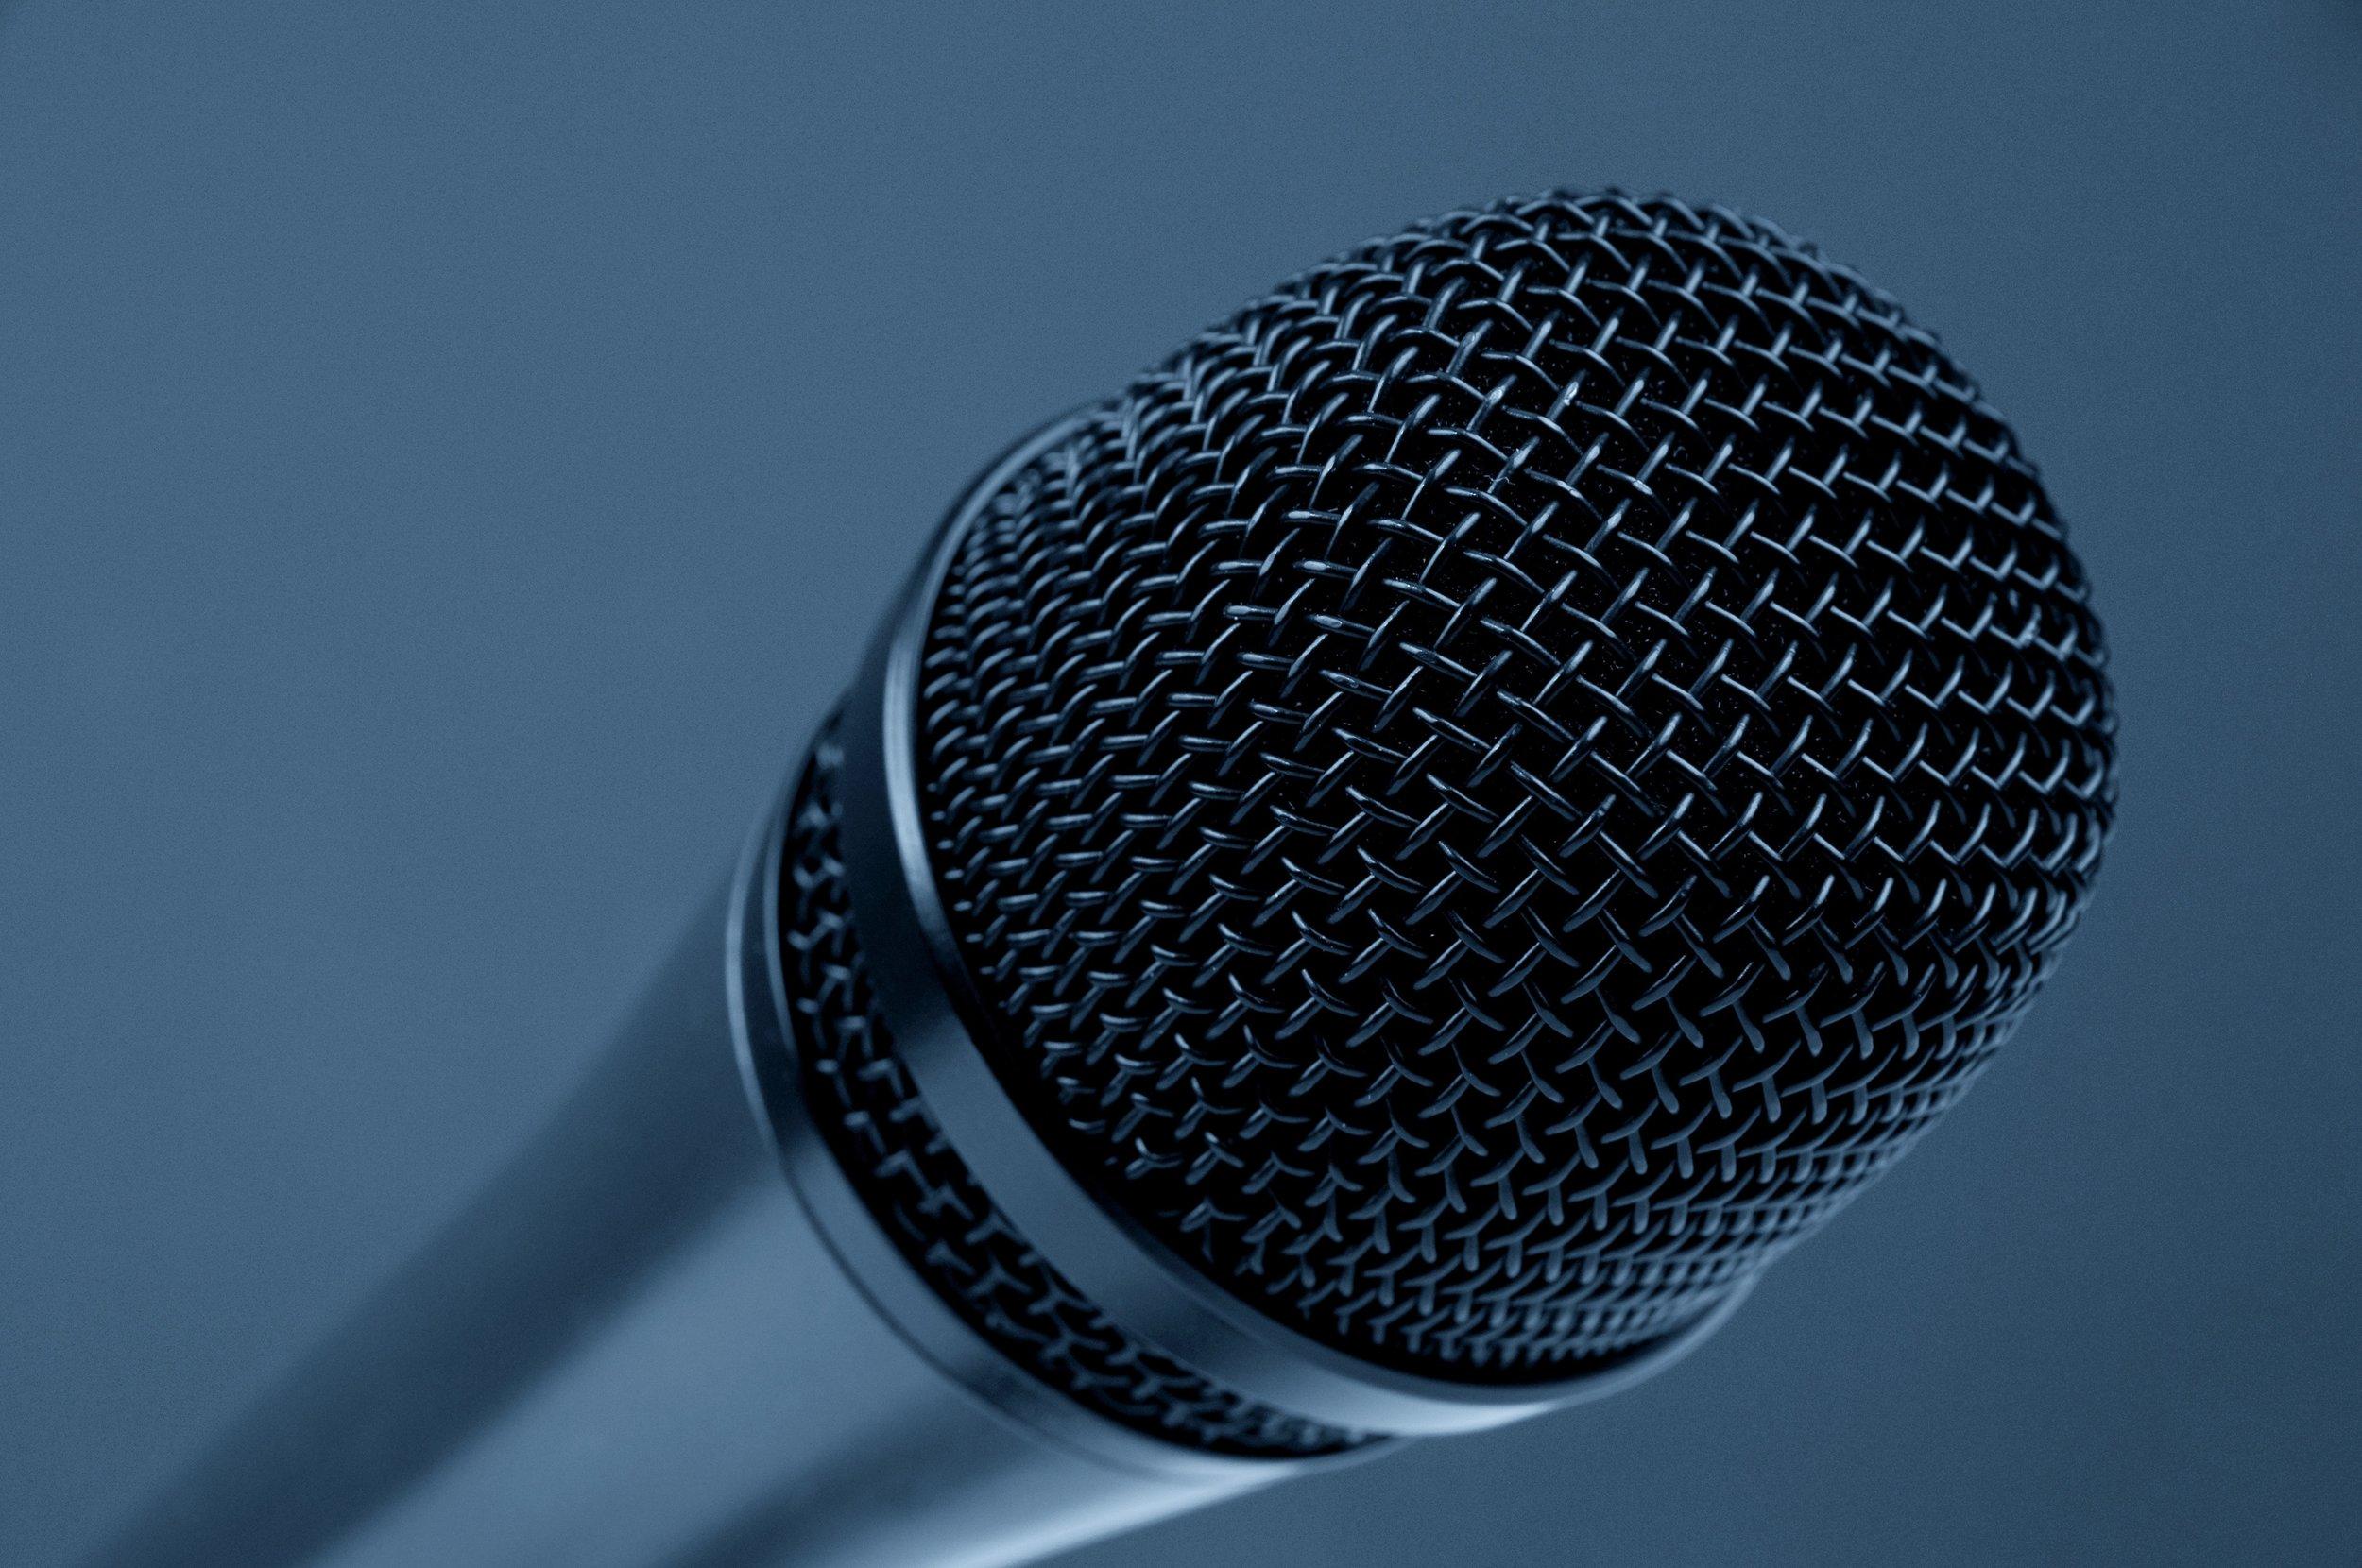 audio-gray-mic-2235.jpg